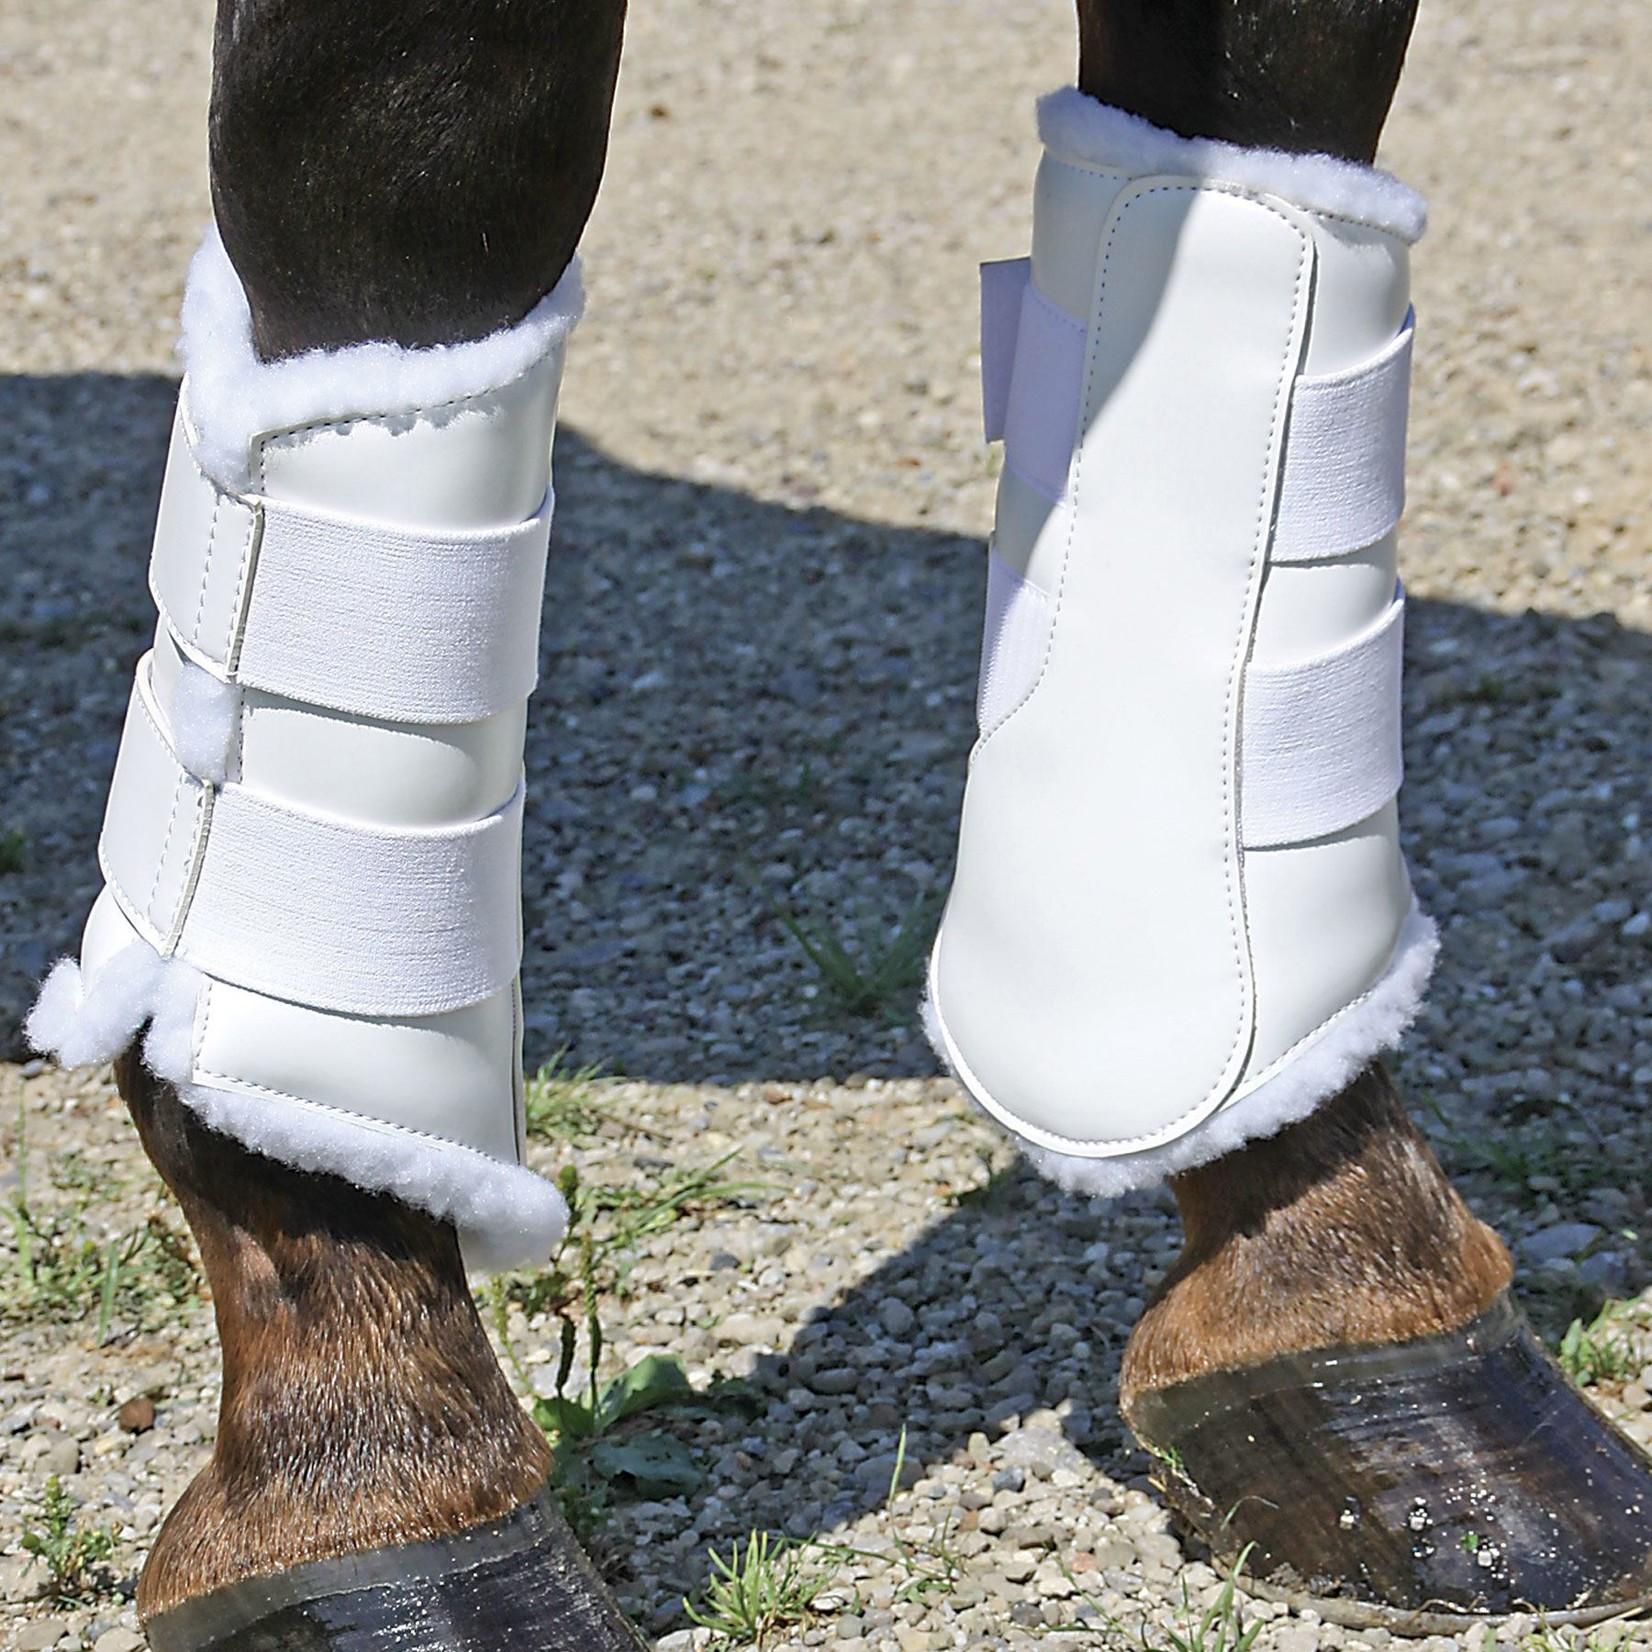 Sport Boot - Synthetic Fleece Lining - Med